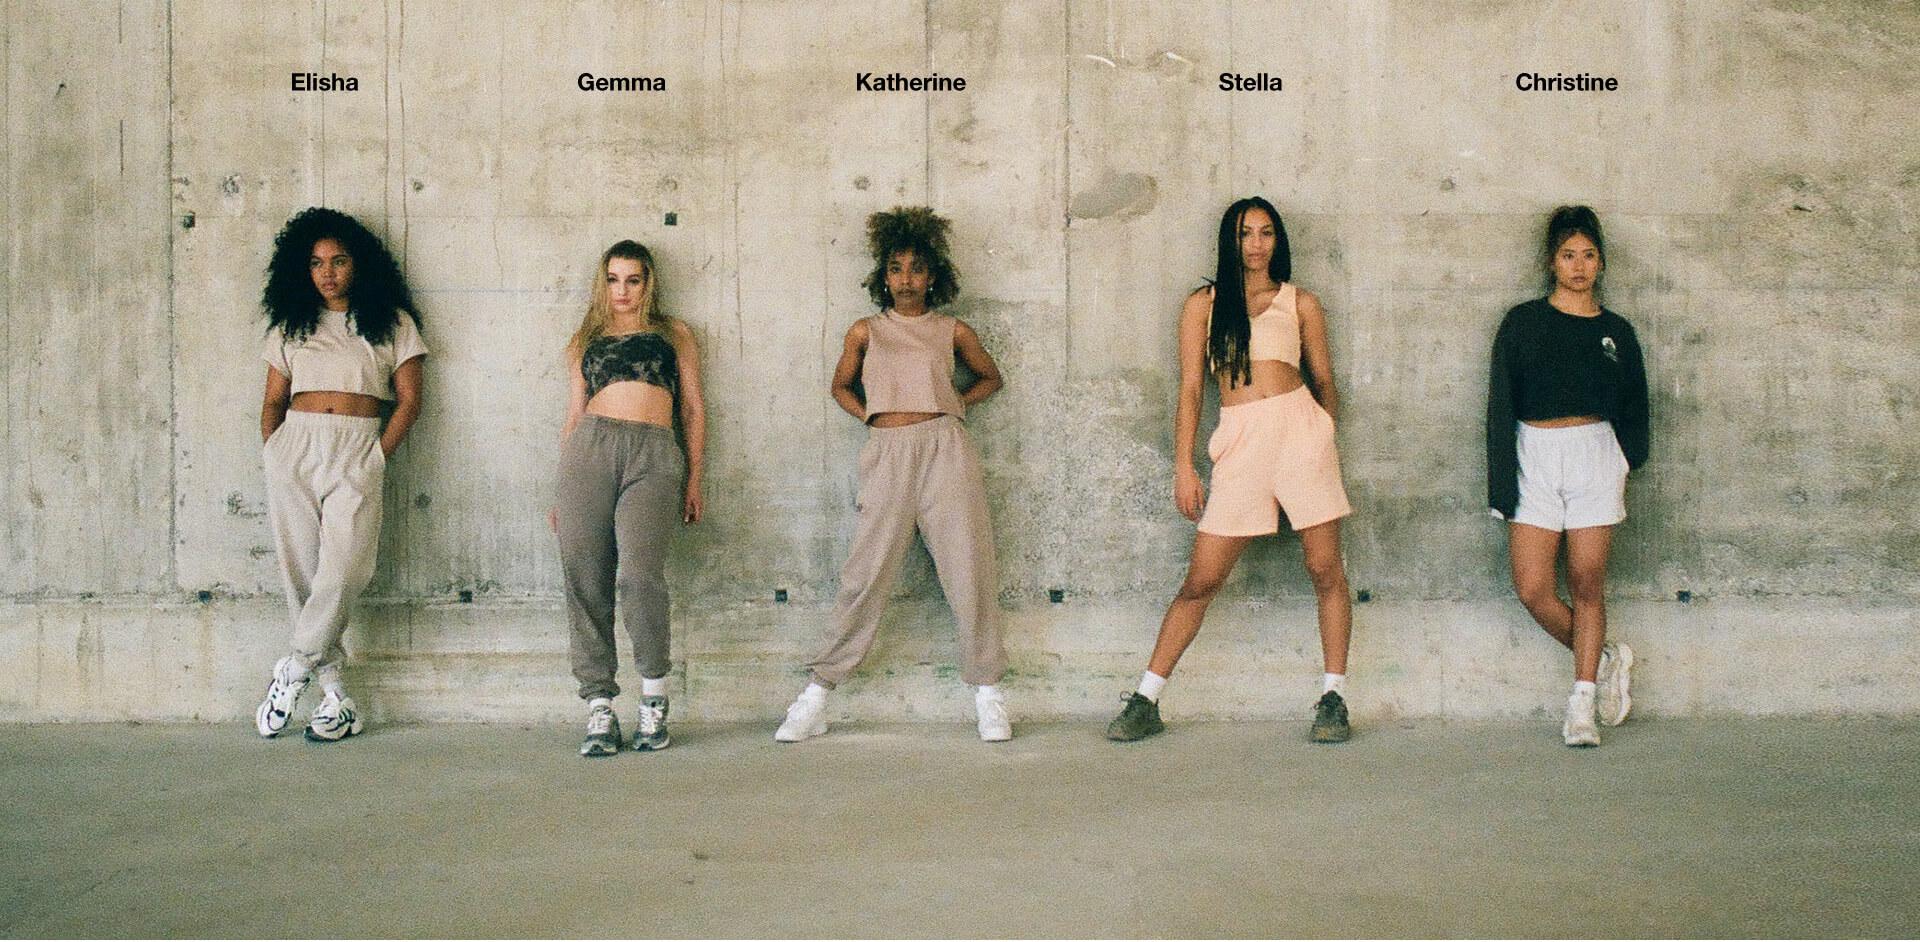 Elisha, Gemma, Katherine, Stella and Christine